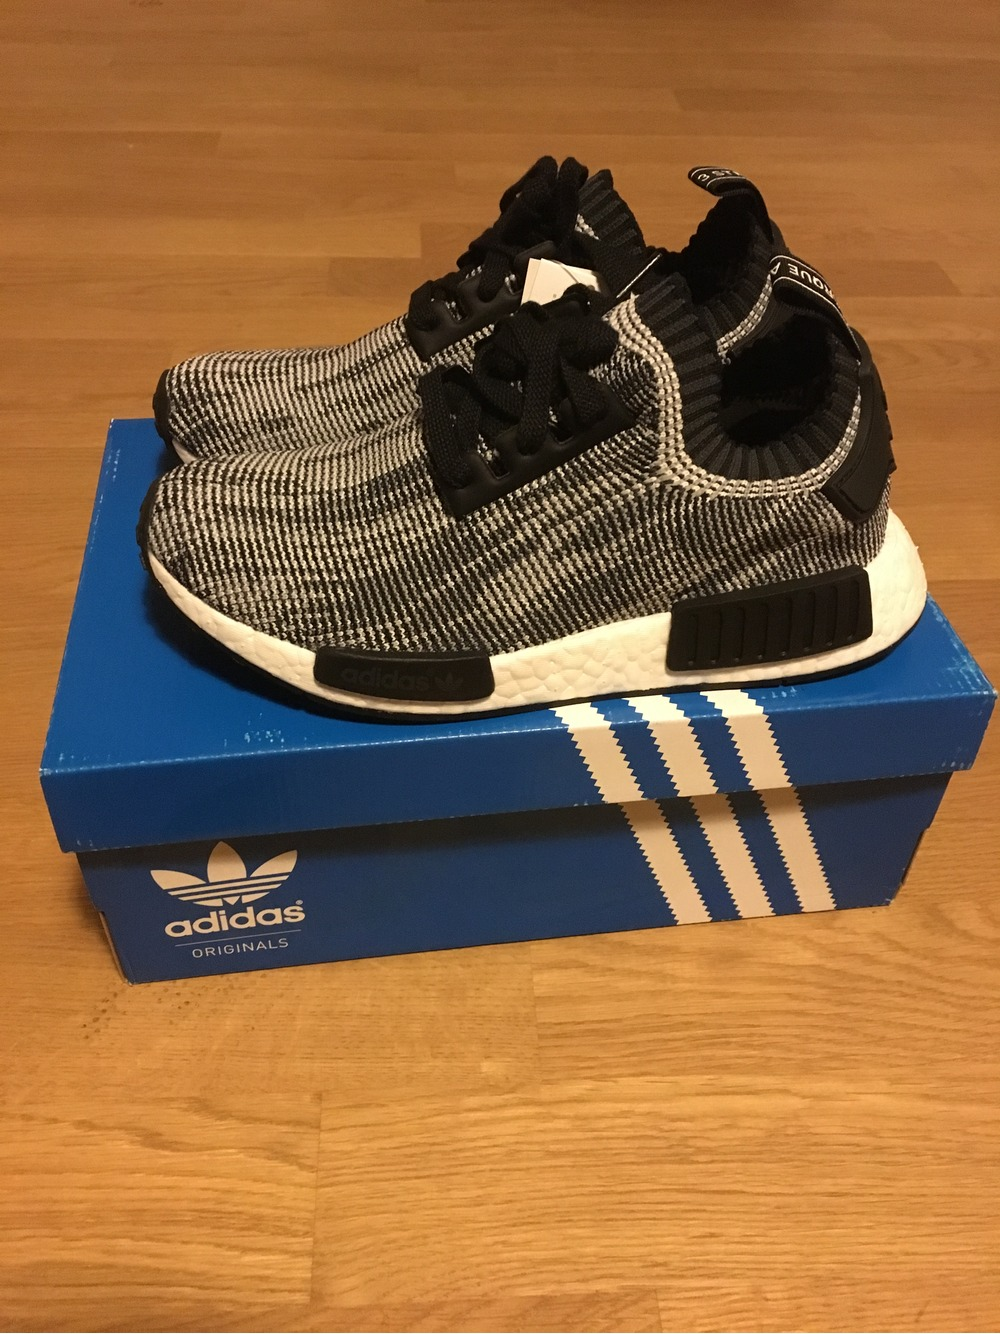 online retailer 93bb2 a04fb Adidas NMD R1 Oreo adidasnmdwomensuk.co.uk